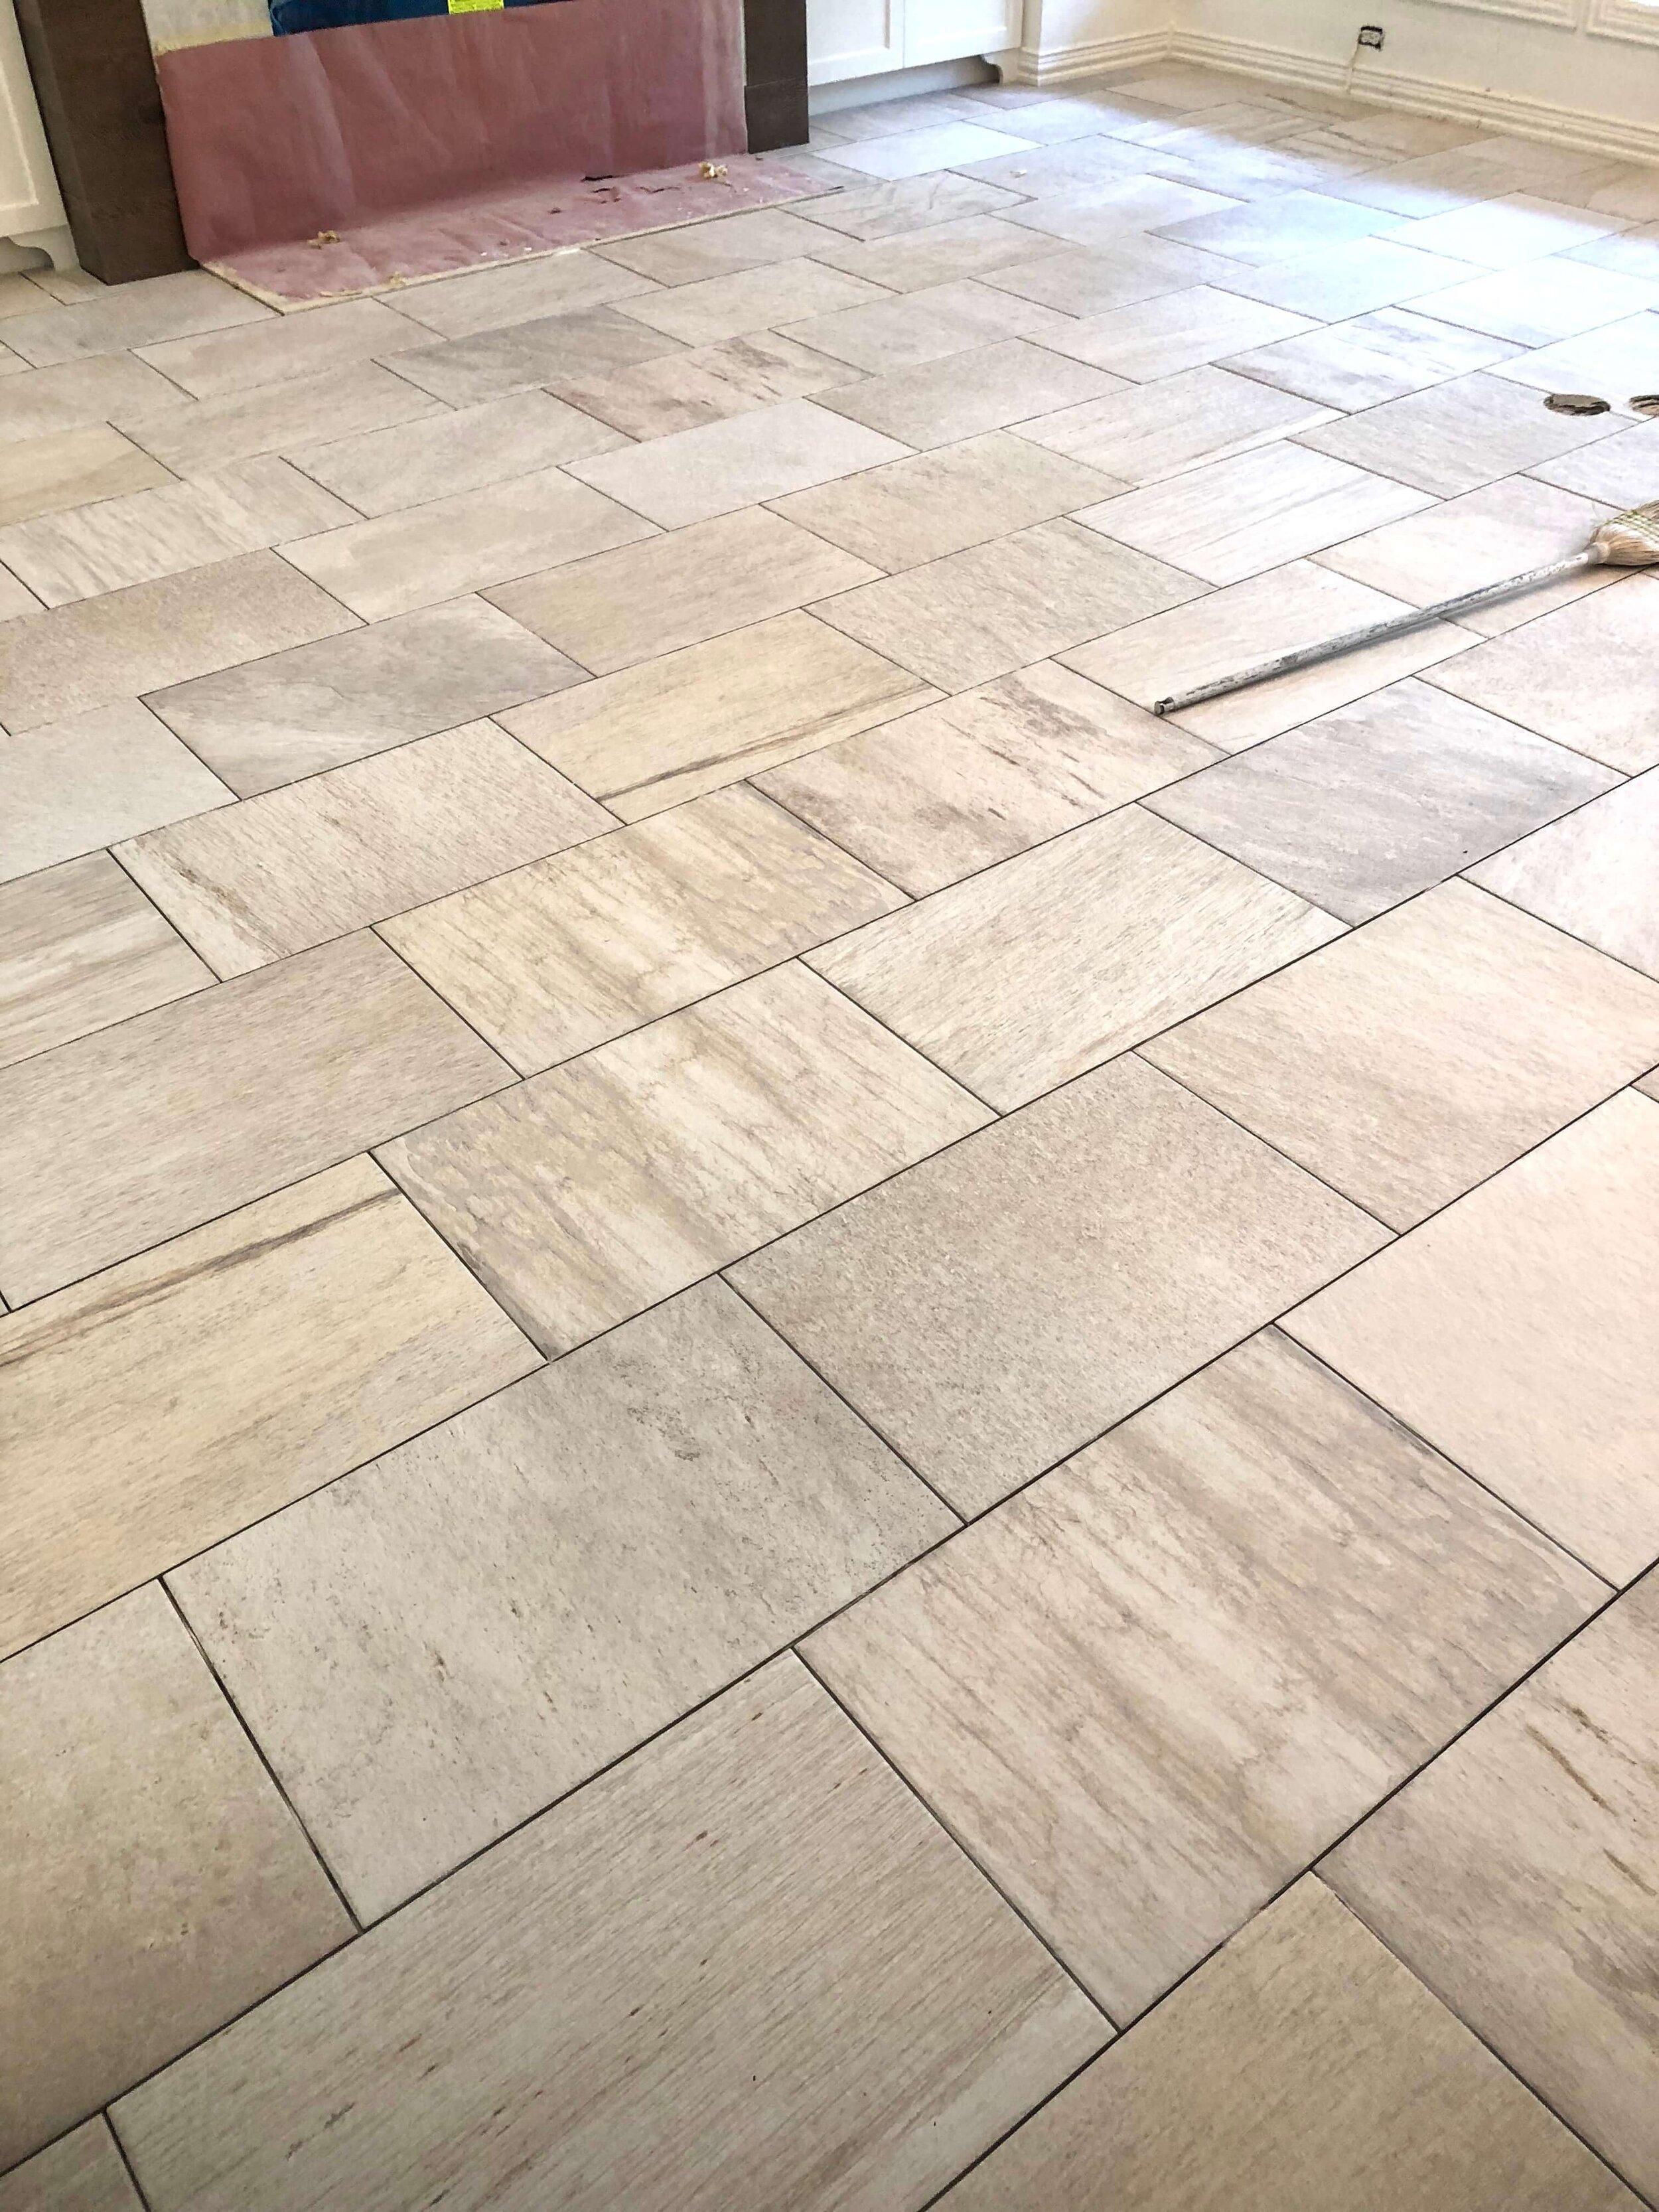 5 tips on choosing flooring for an open